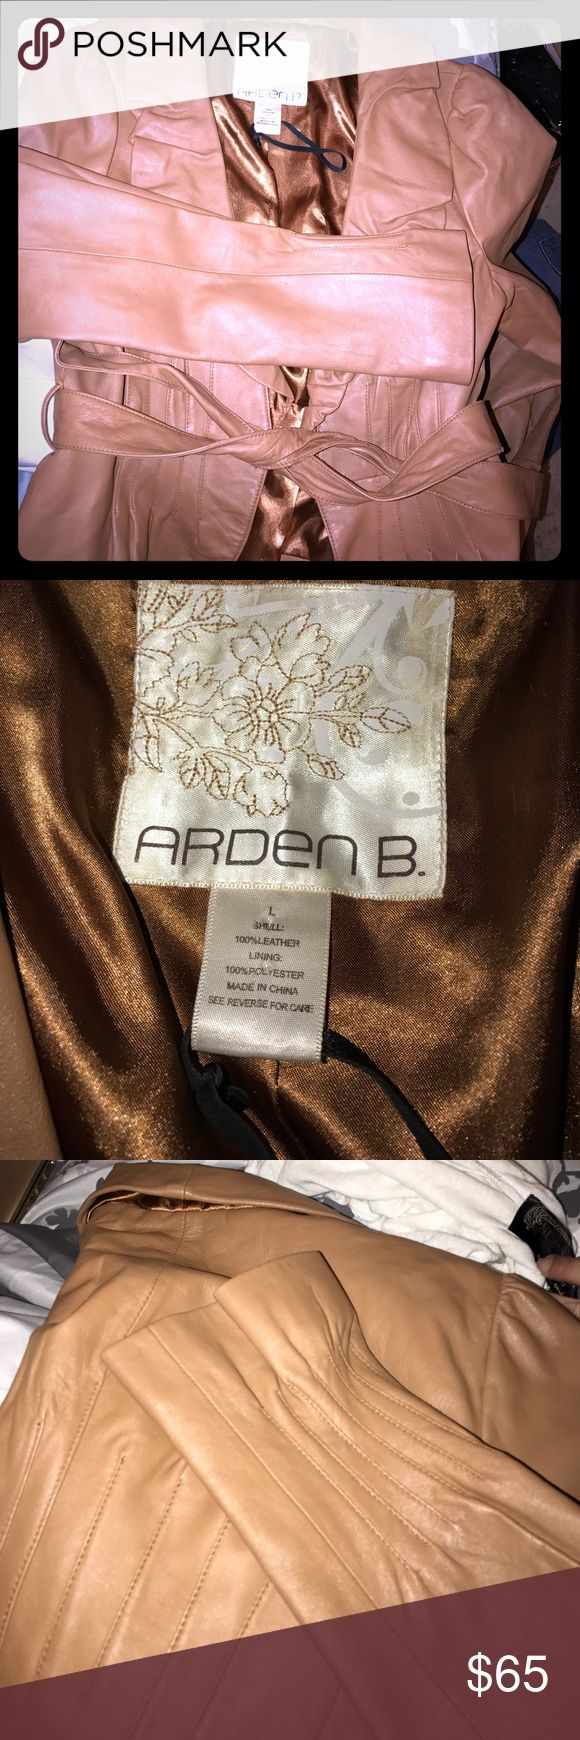 Arden B camel colored 100% leather jacket large Arden B camel colored 100% leather jacket large Arden B Jackets & Coats